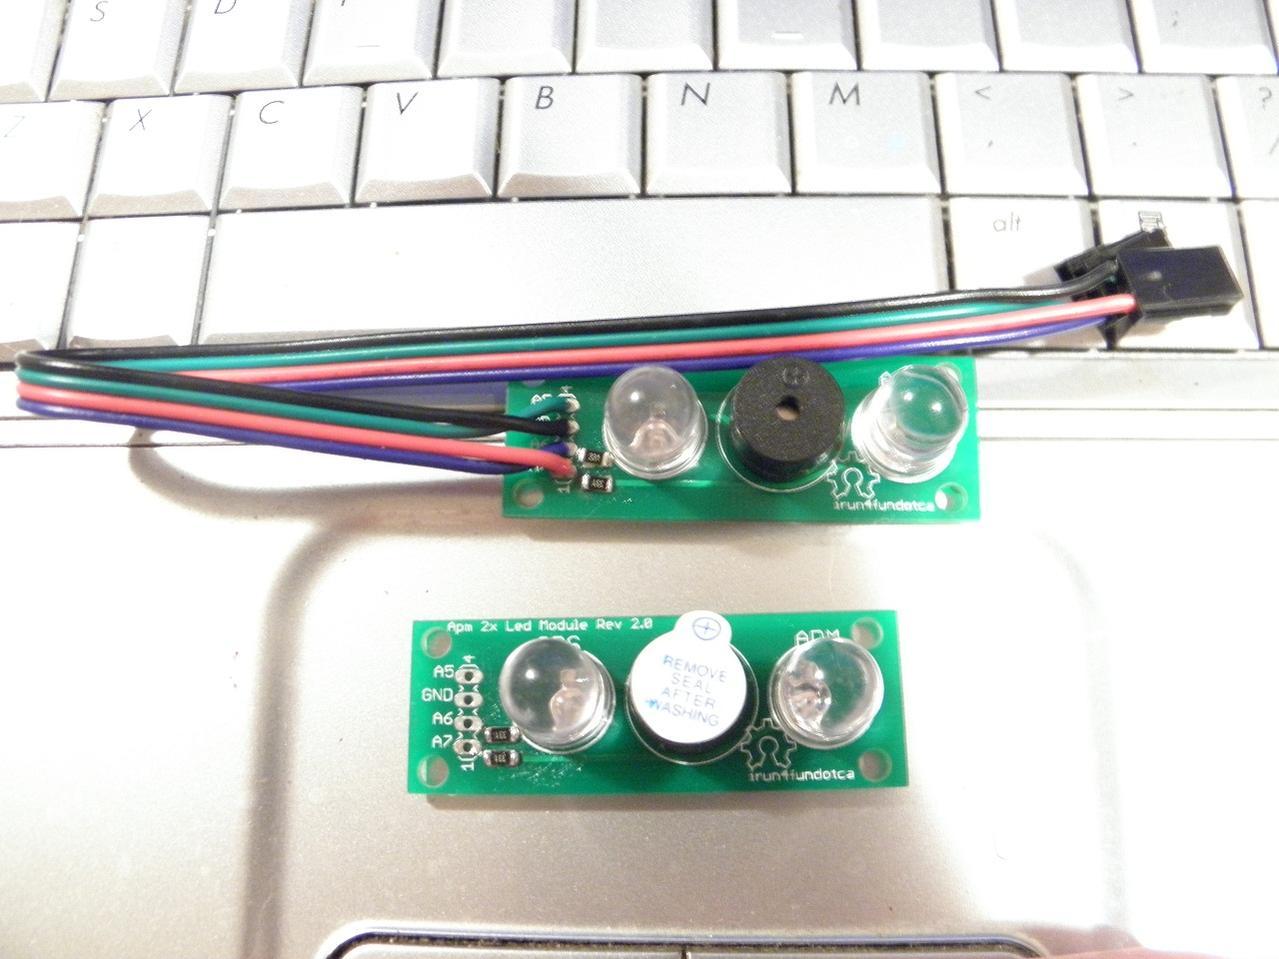 apm quad wiring diagram for led [ 1279 x 959 Pixel ]